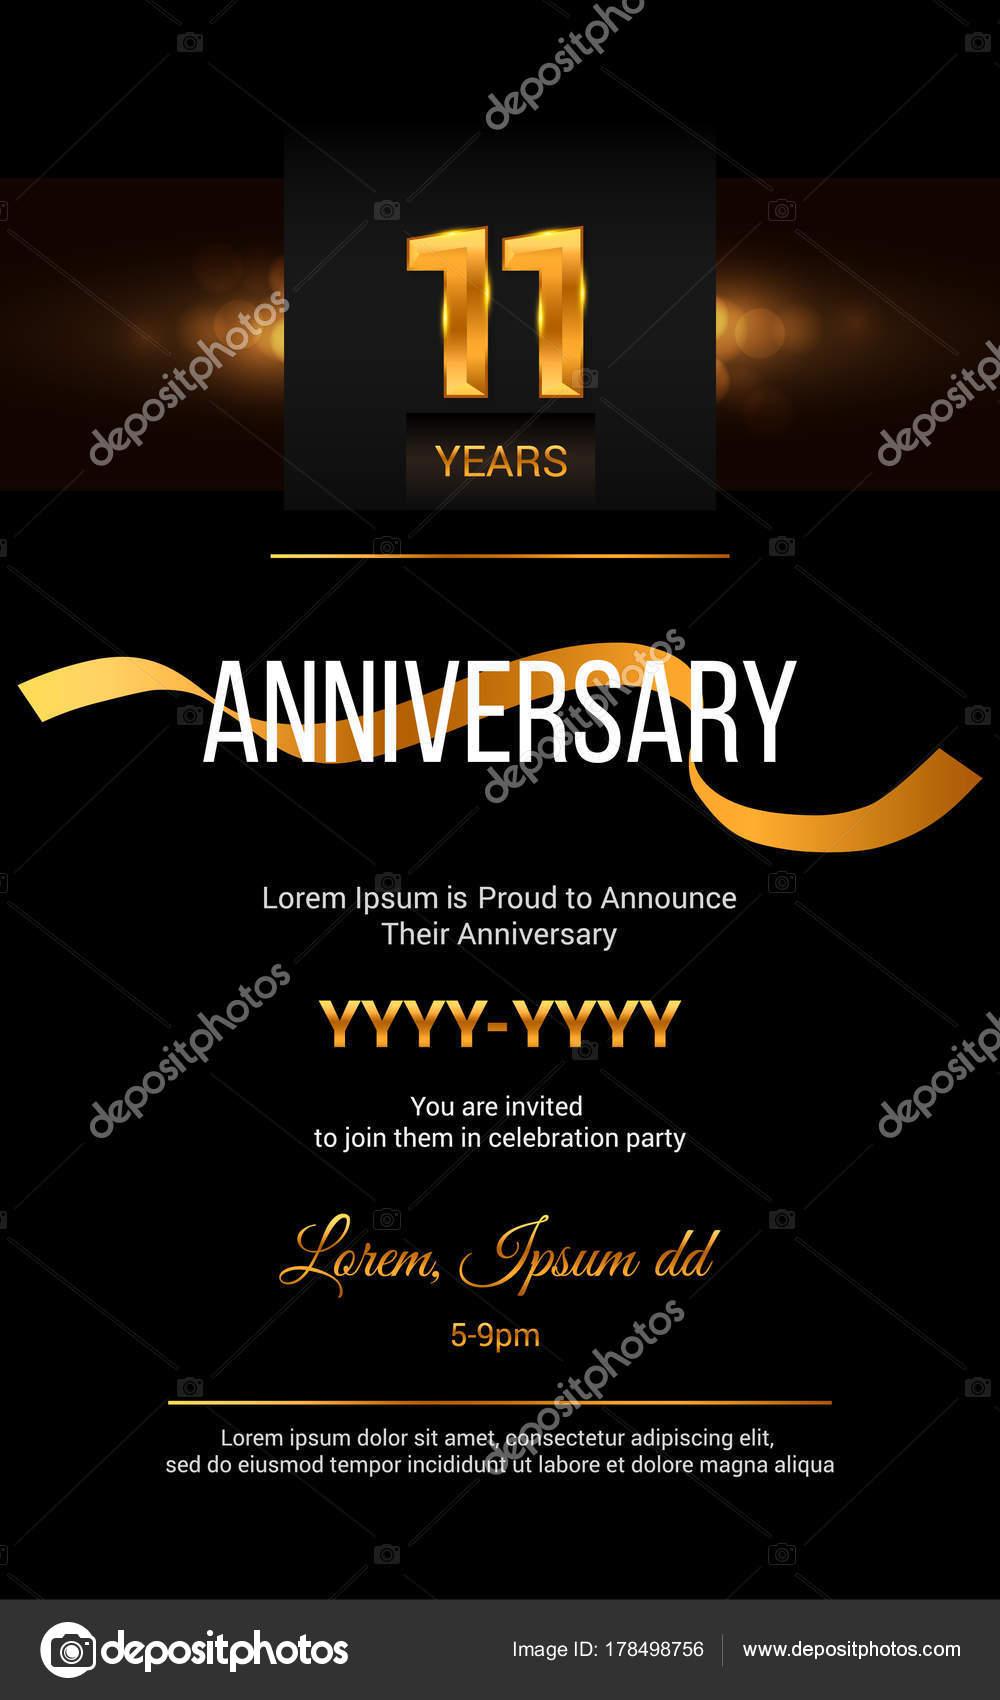 11 years anniversary invitation card stock vector 11 years anniversary invitation card stock vector stopboris Choice Image